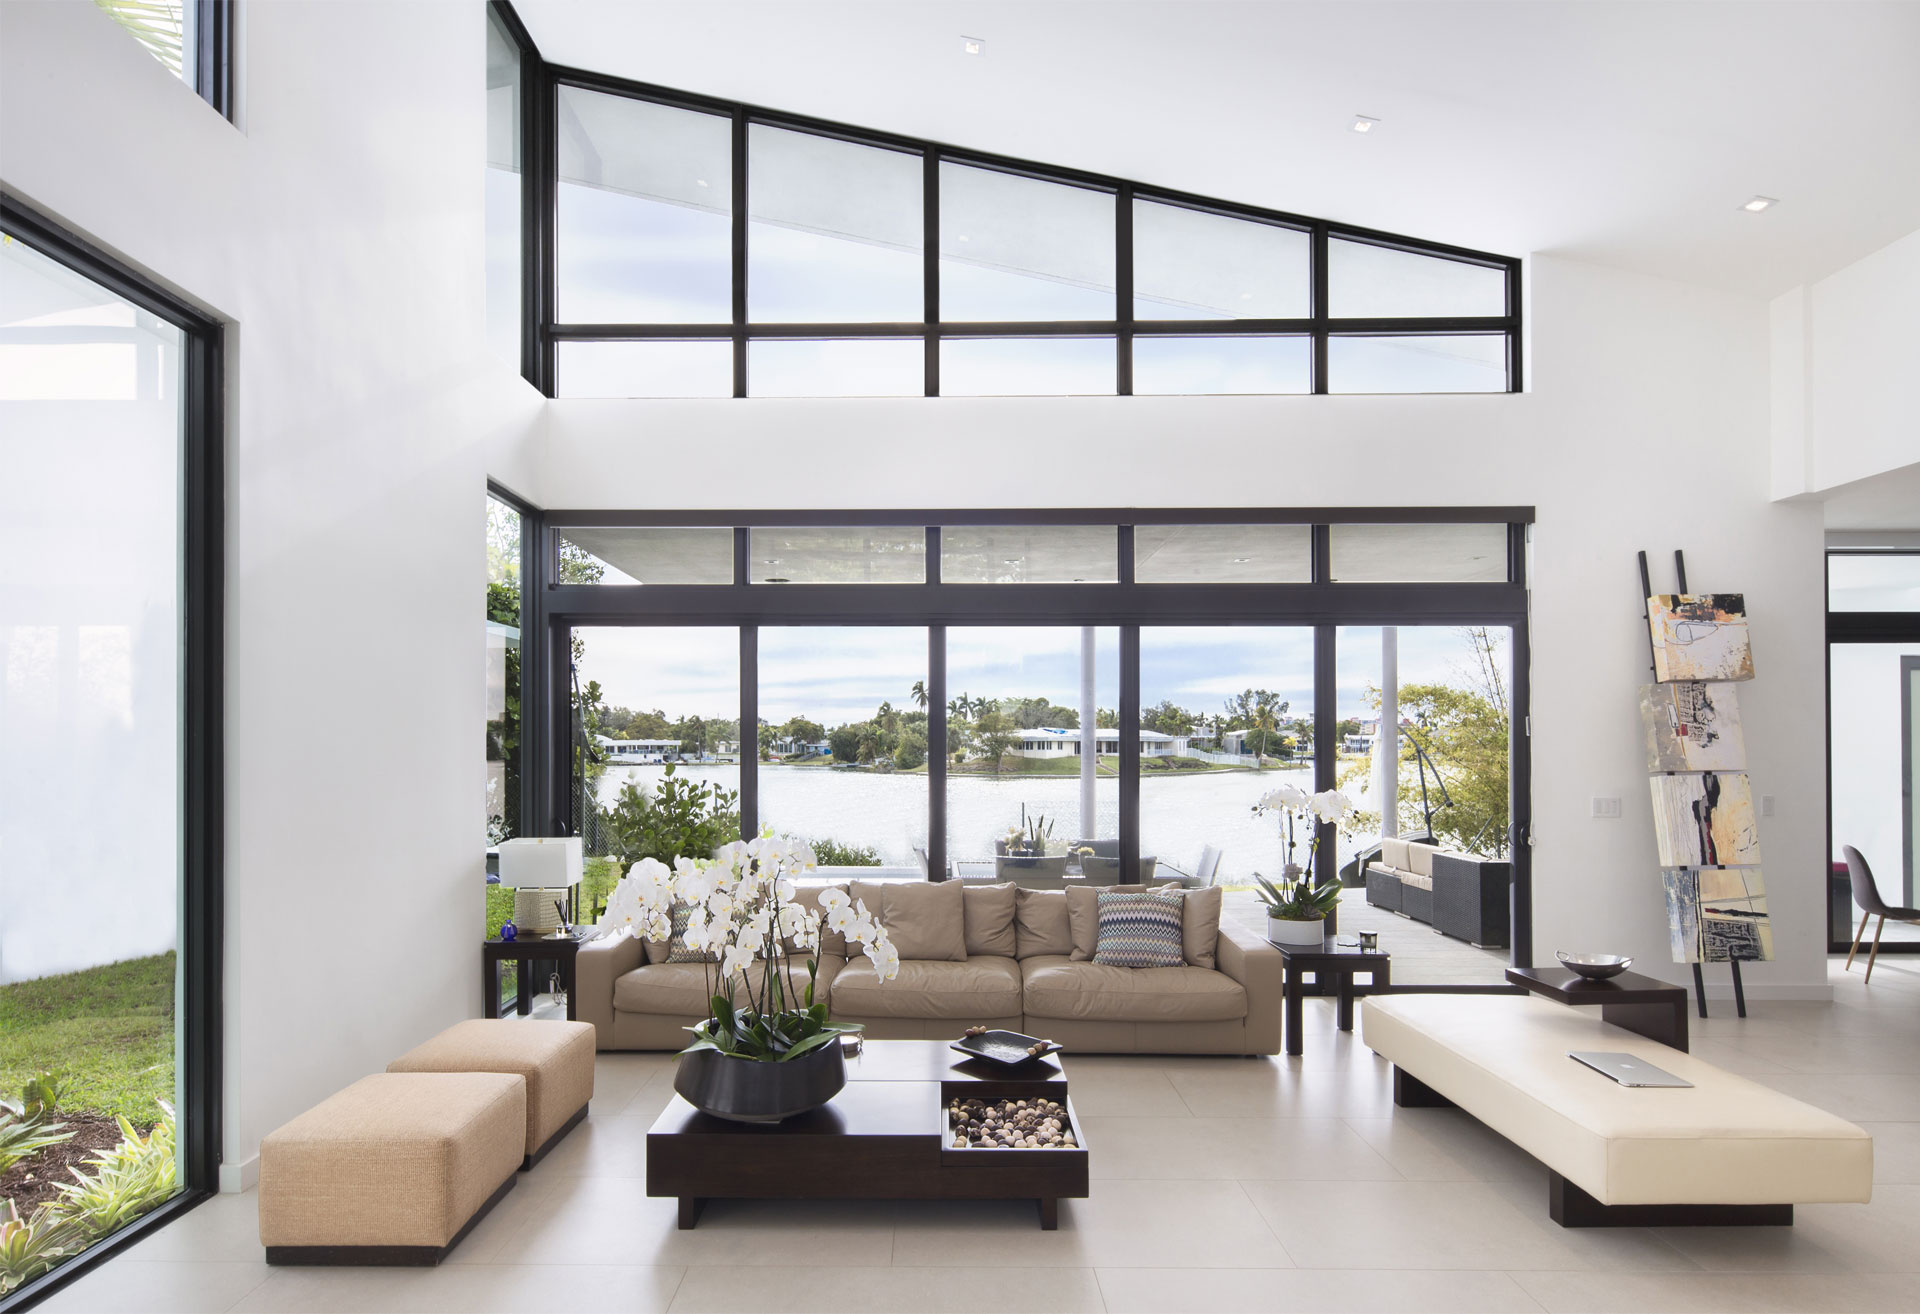 Interior Design project in Sky Lake I, Florida